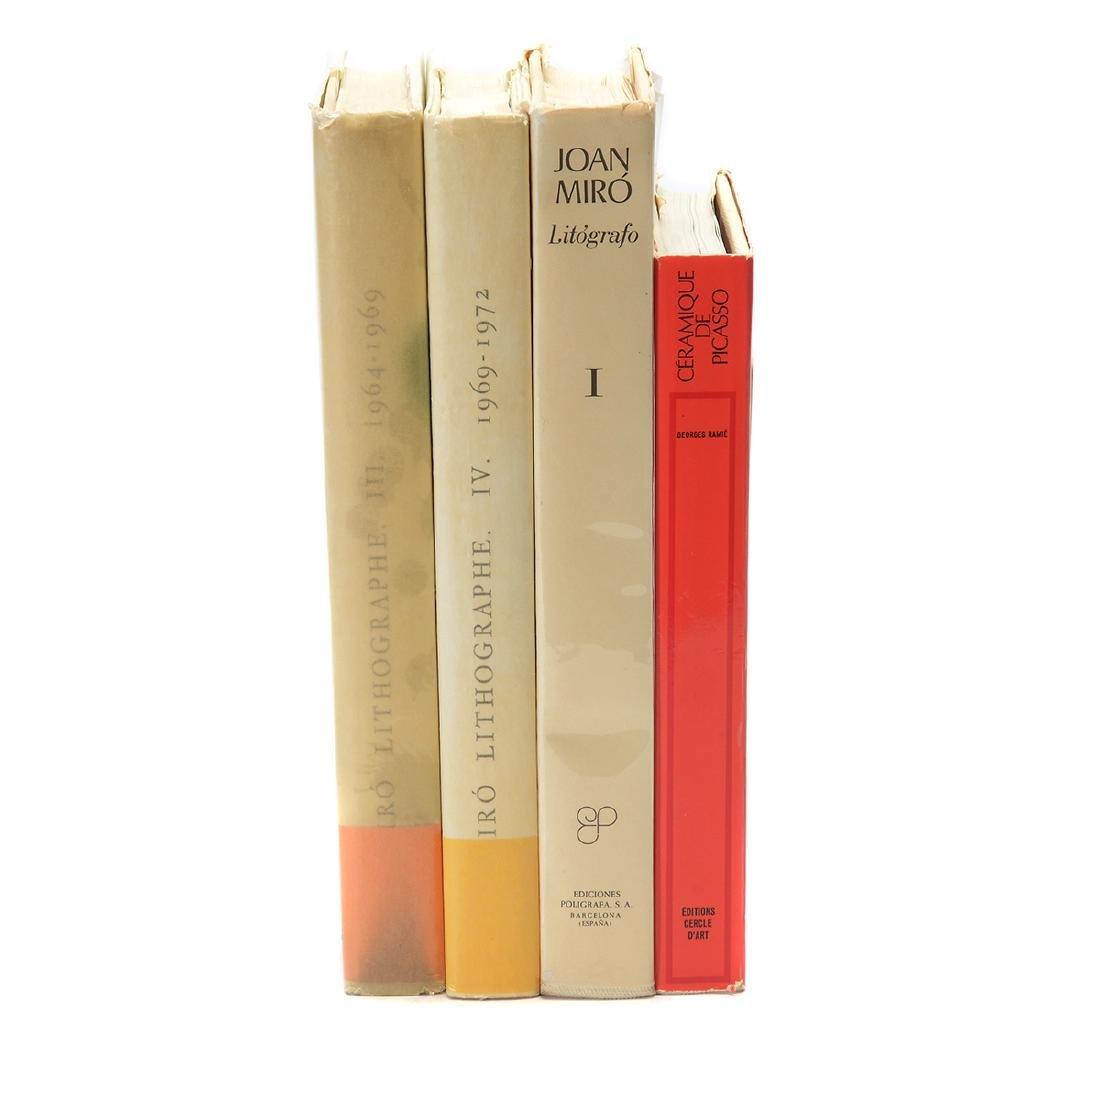 Set of 4 Books including three volumes of Joan Miro